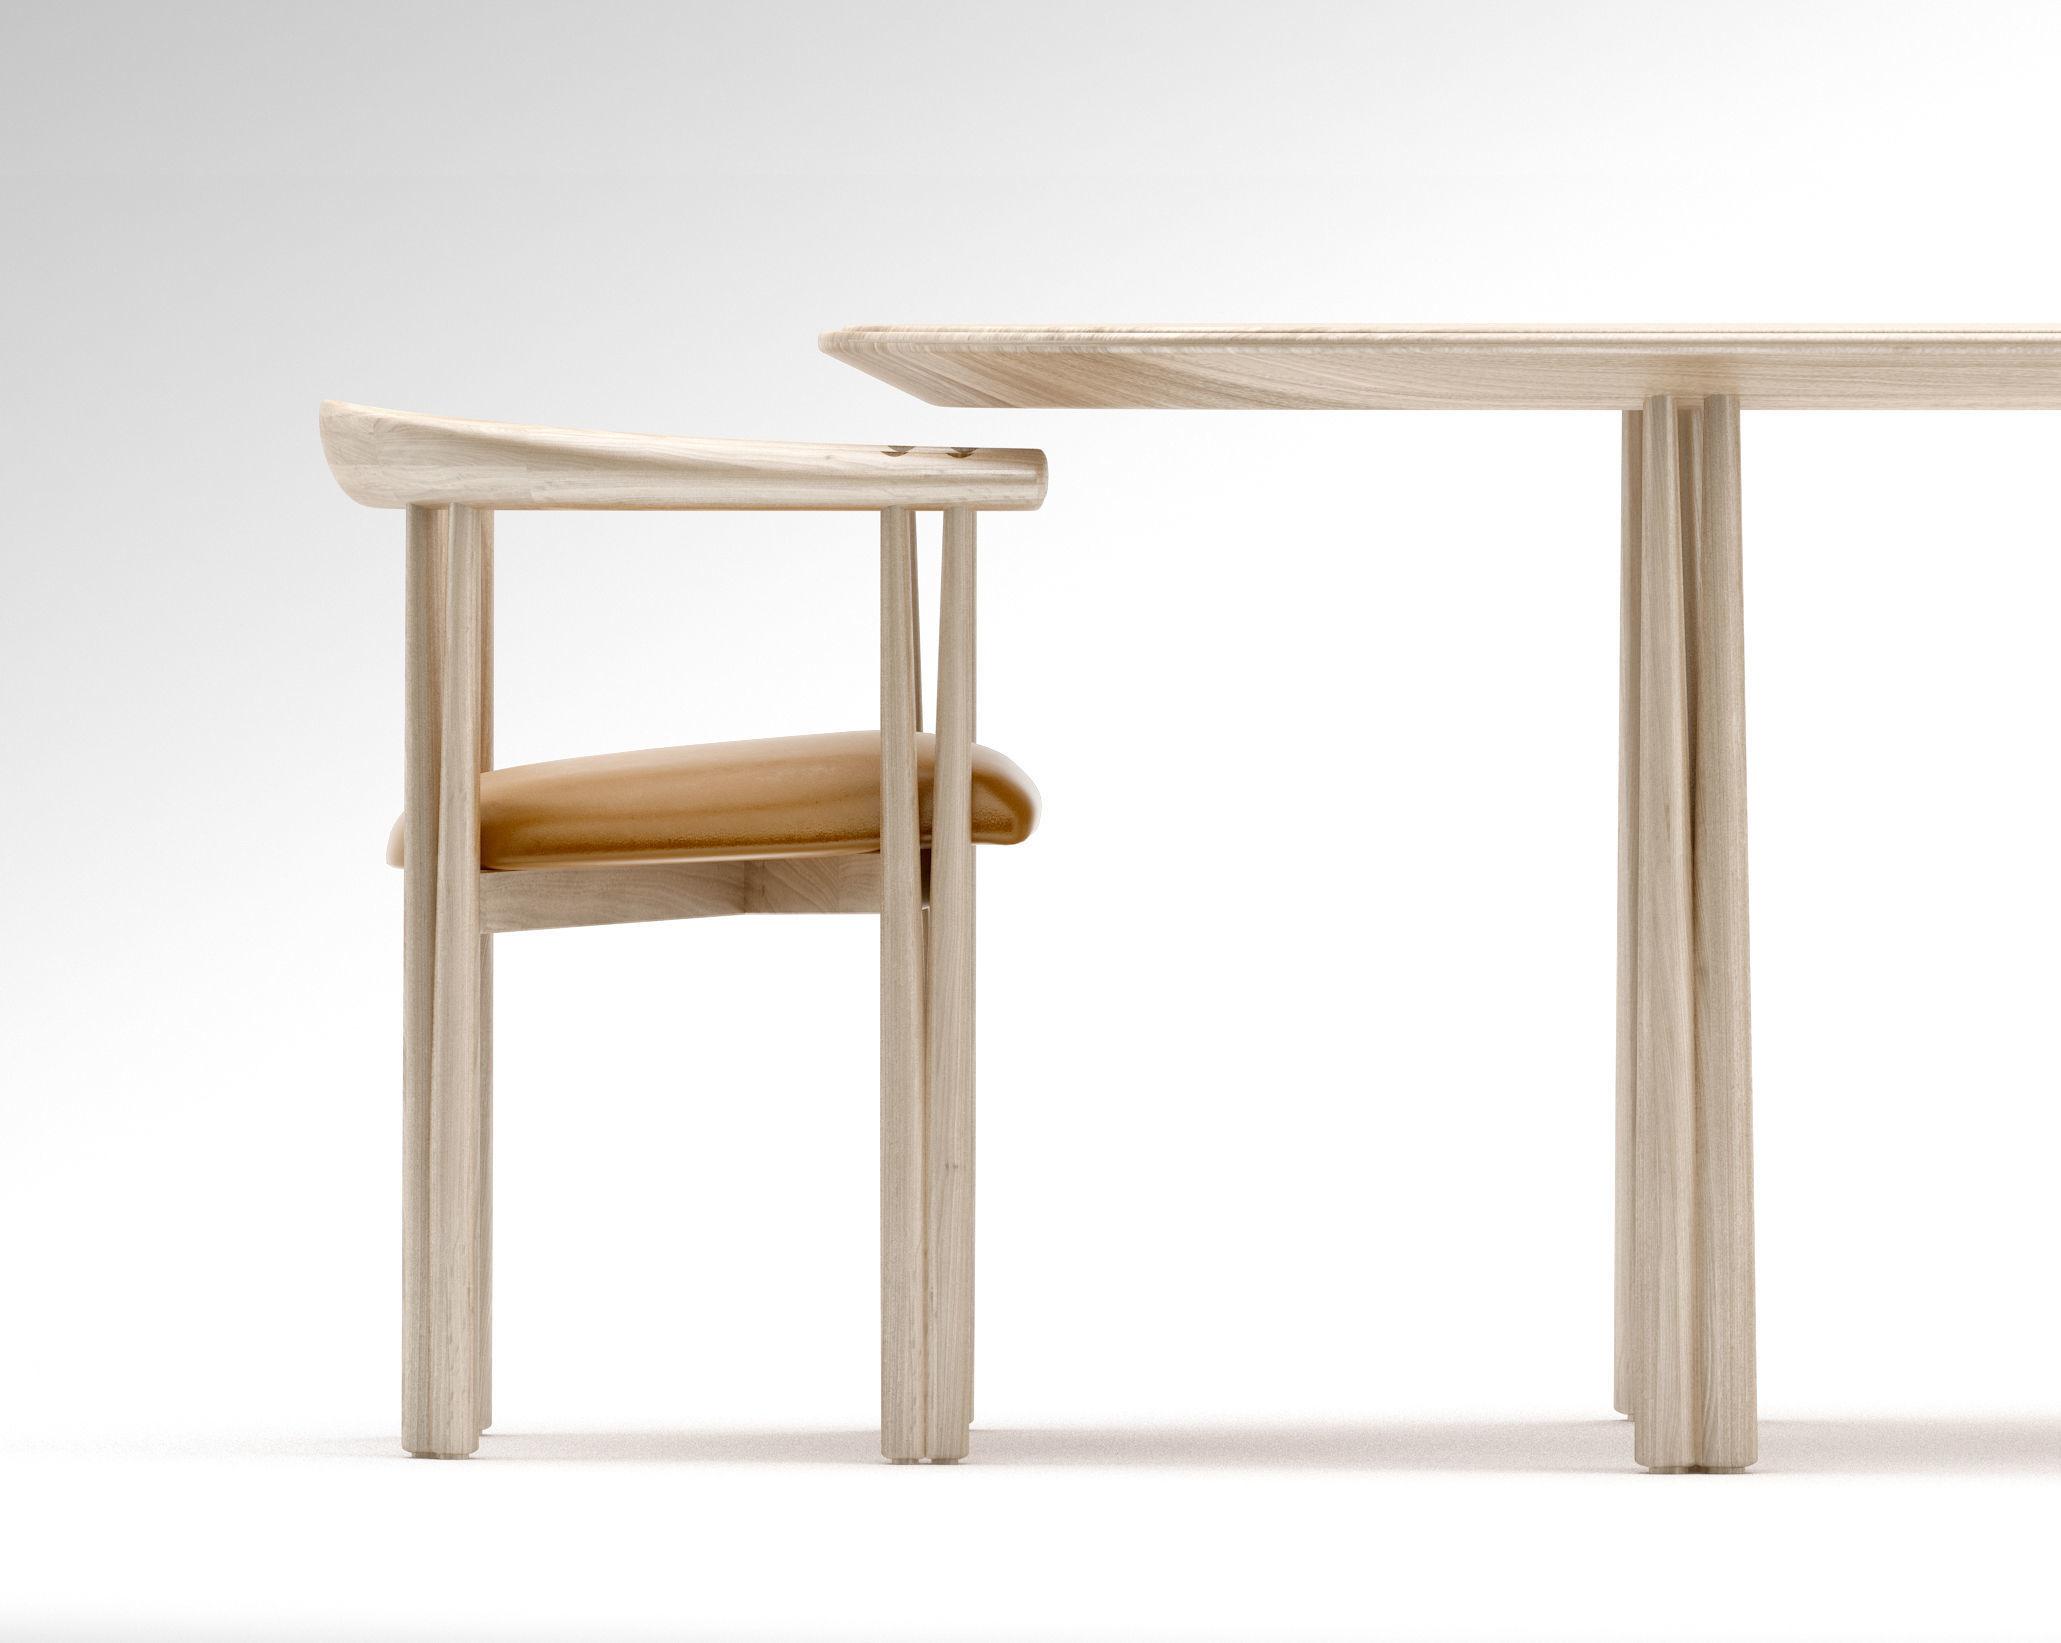 De la Espada Elliot dining chair and Elliot dining table